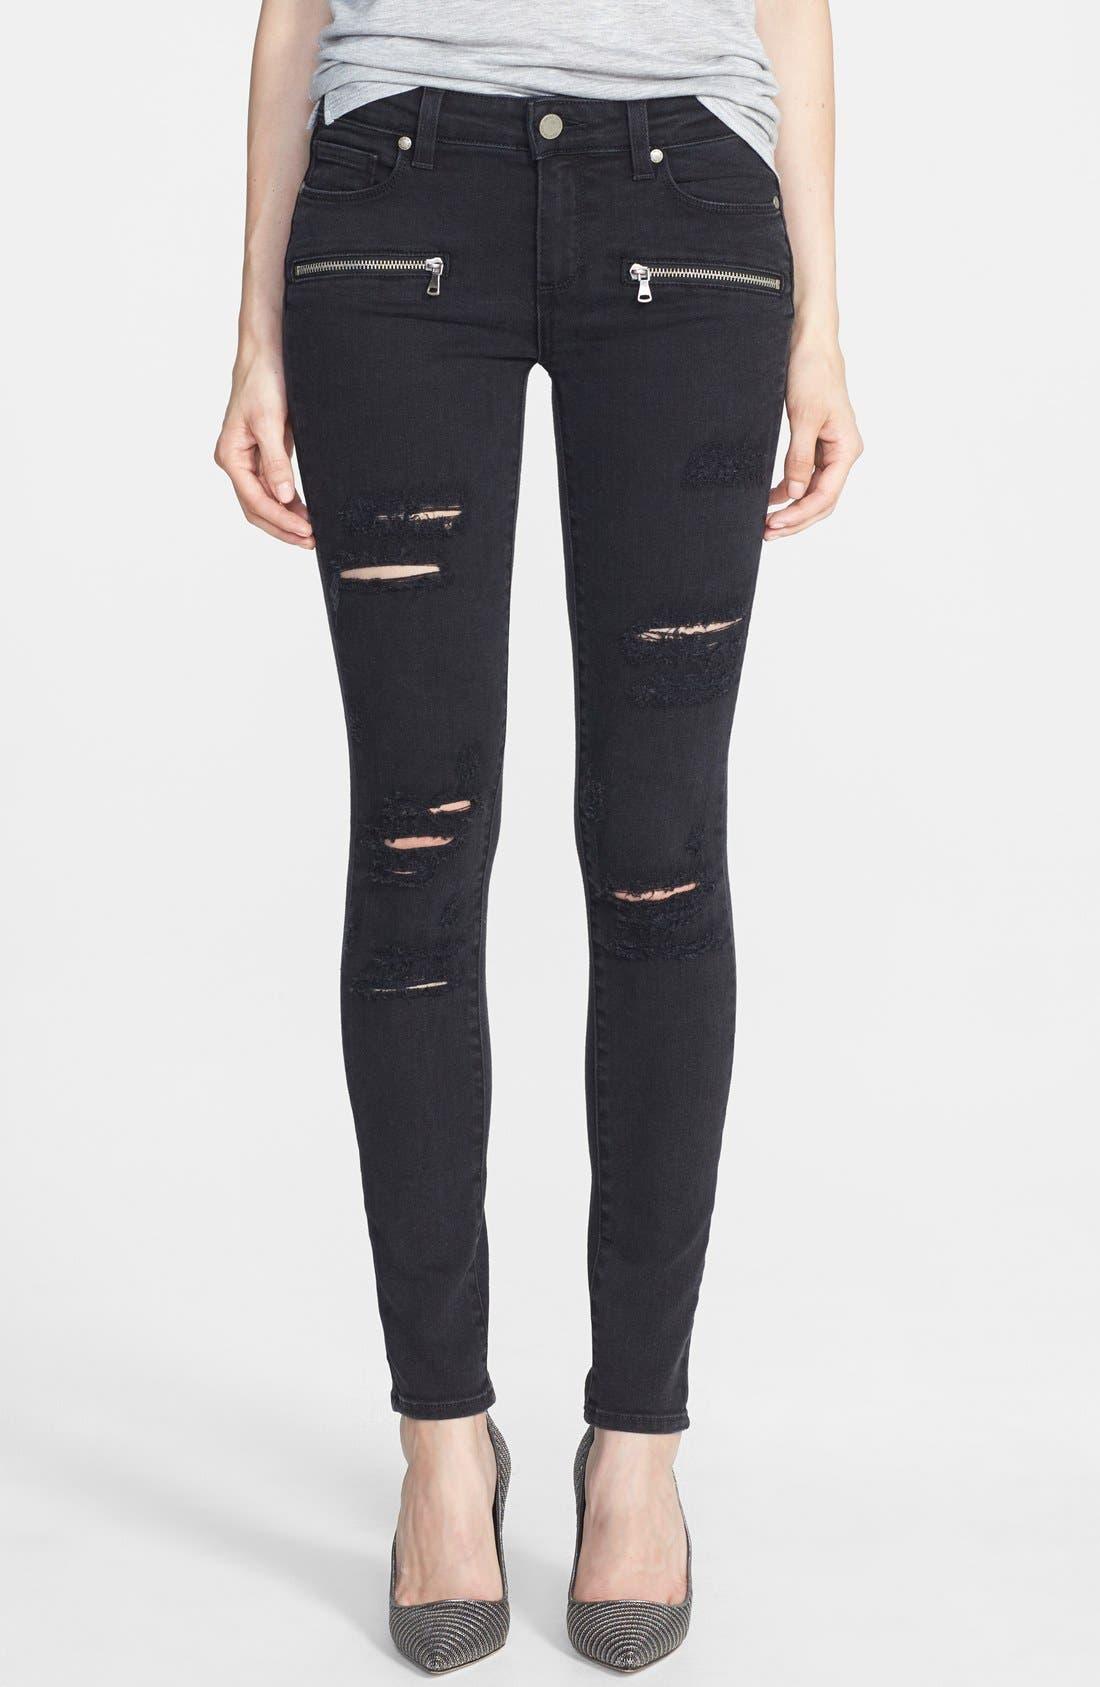 Alternate Image 1 Selected - Paige Denim 'Indio' Zip Detail Skinny Jeans (Ramone Destructed)